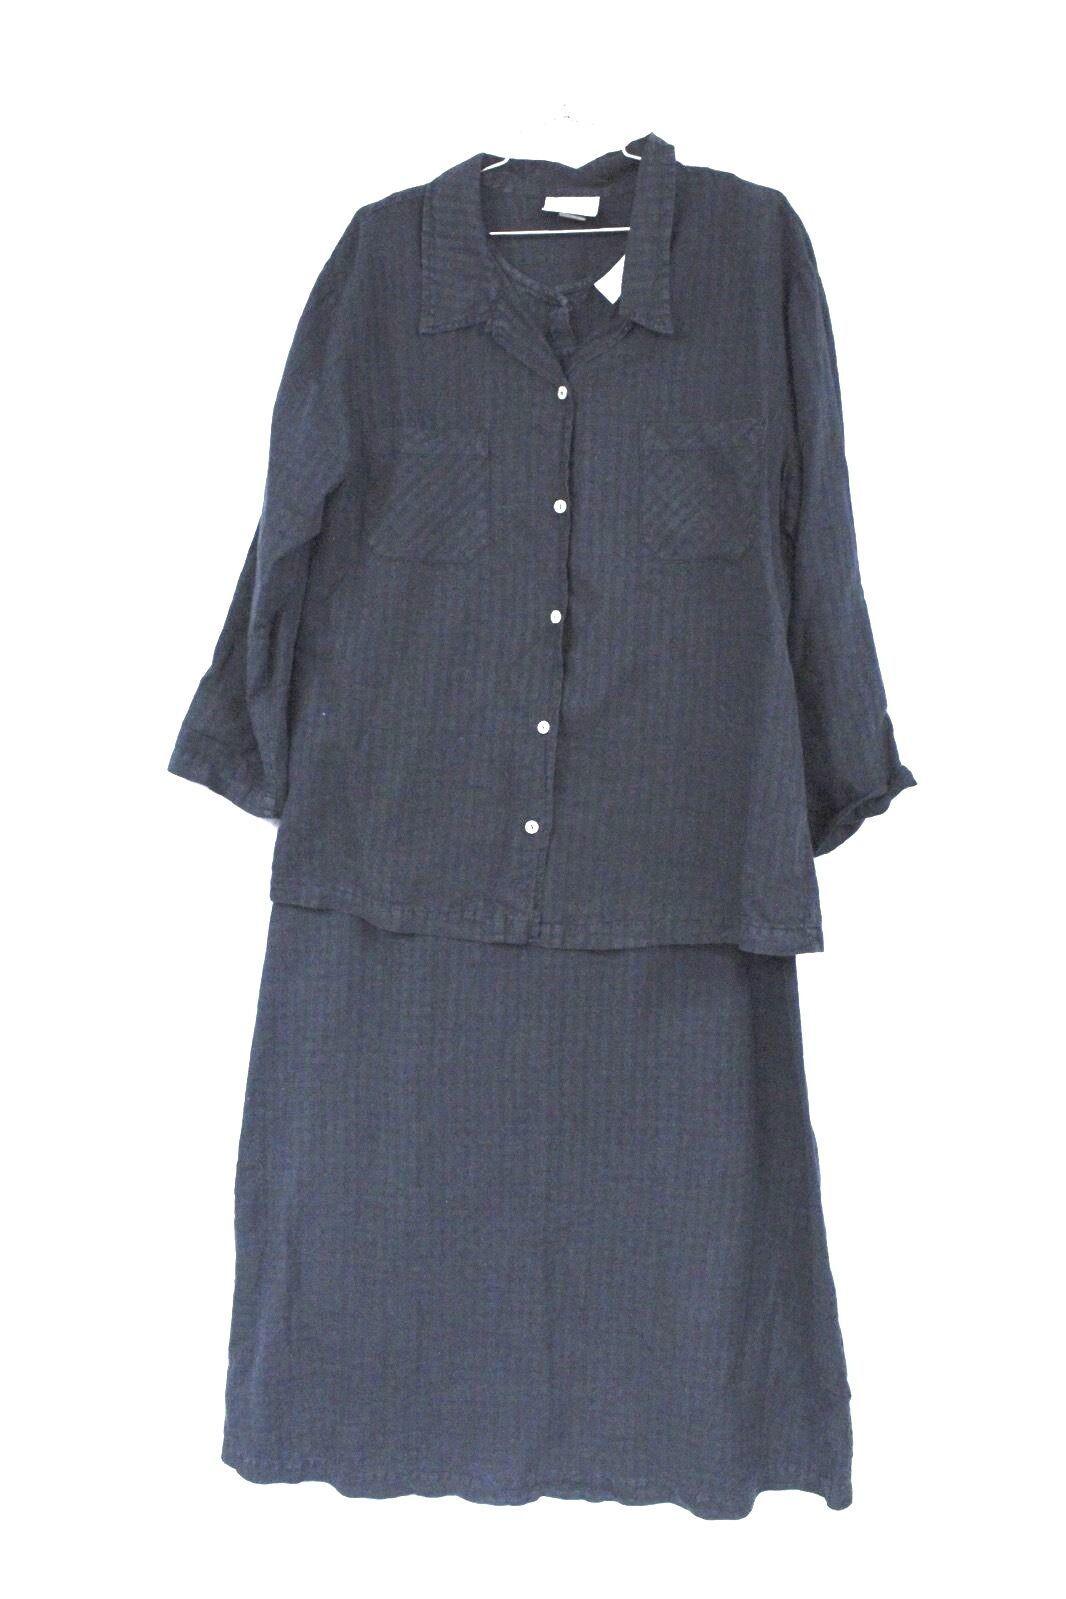 Fresh Produce Tank Maxi Dress & Jacket Blouse Top Black Windowpane Print  M